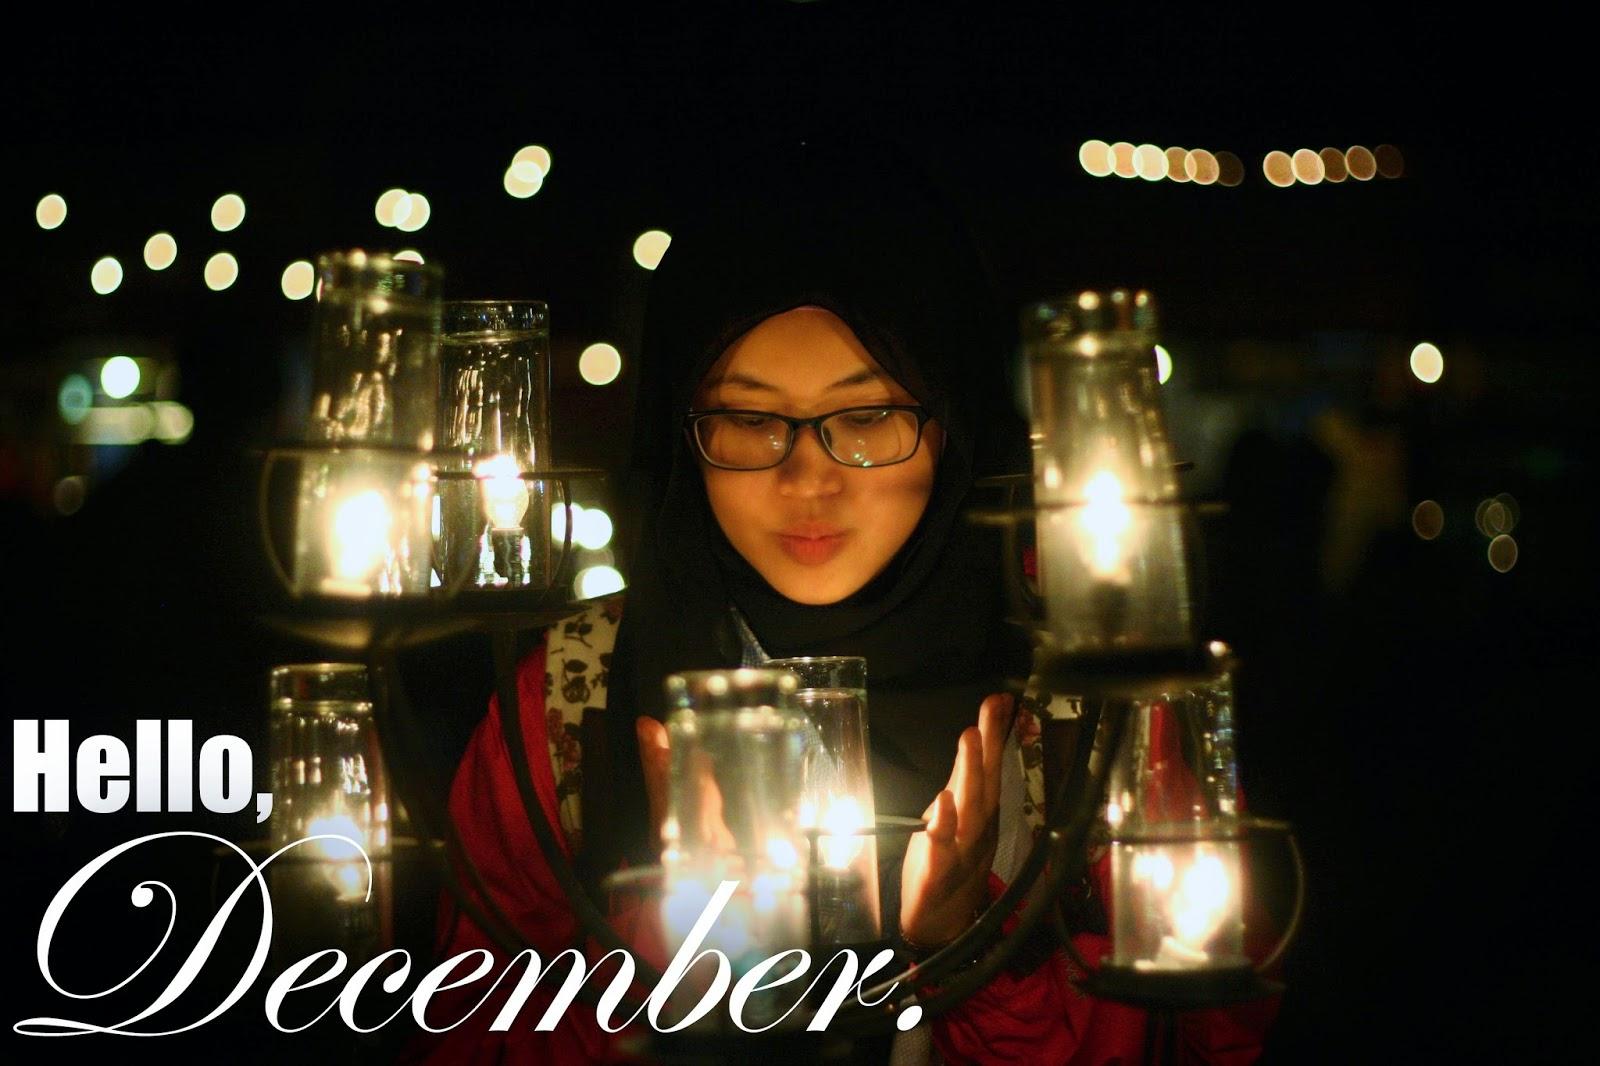 Gambar Selamat Datang Desember 22